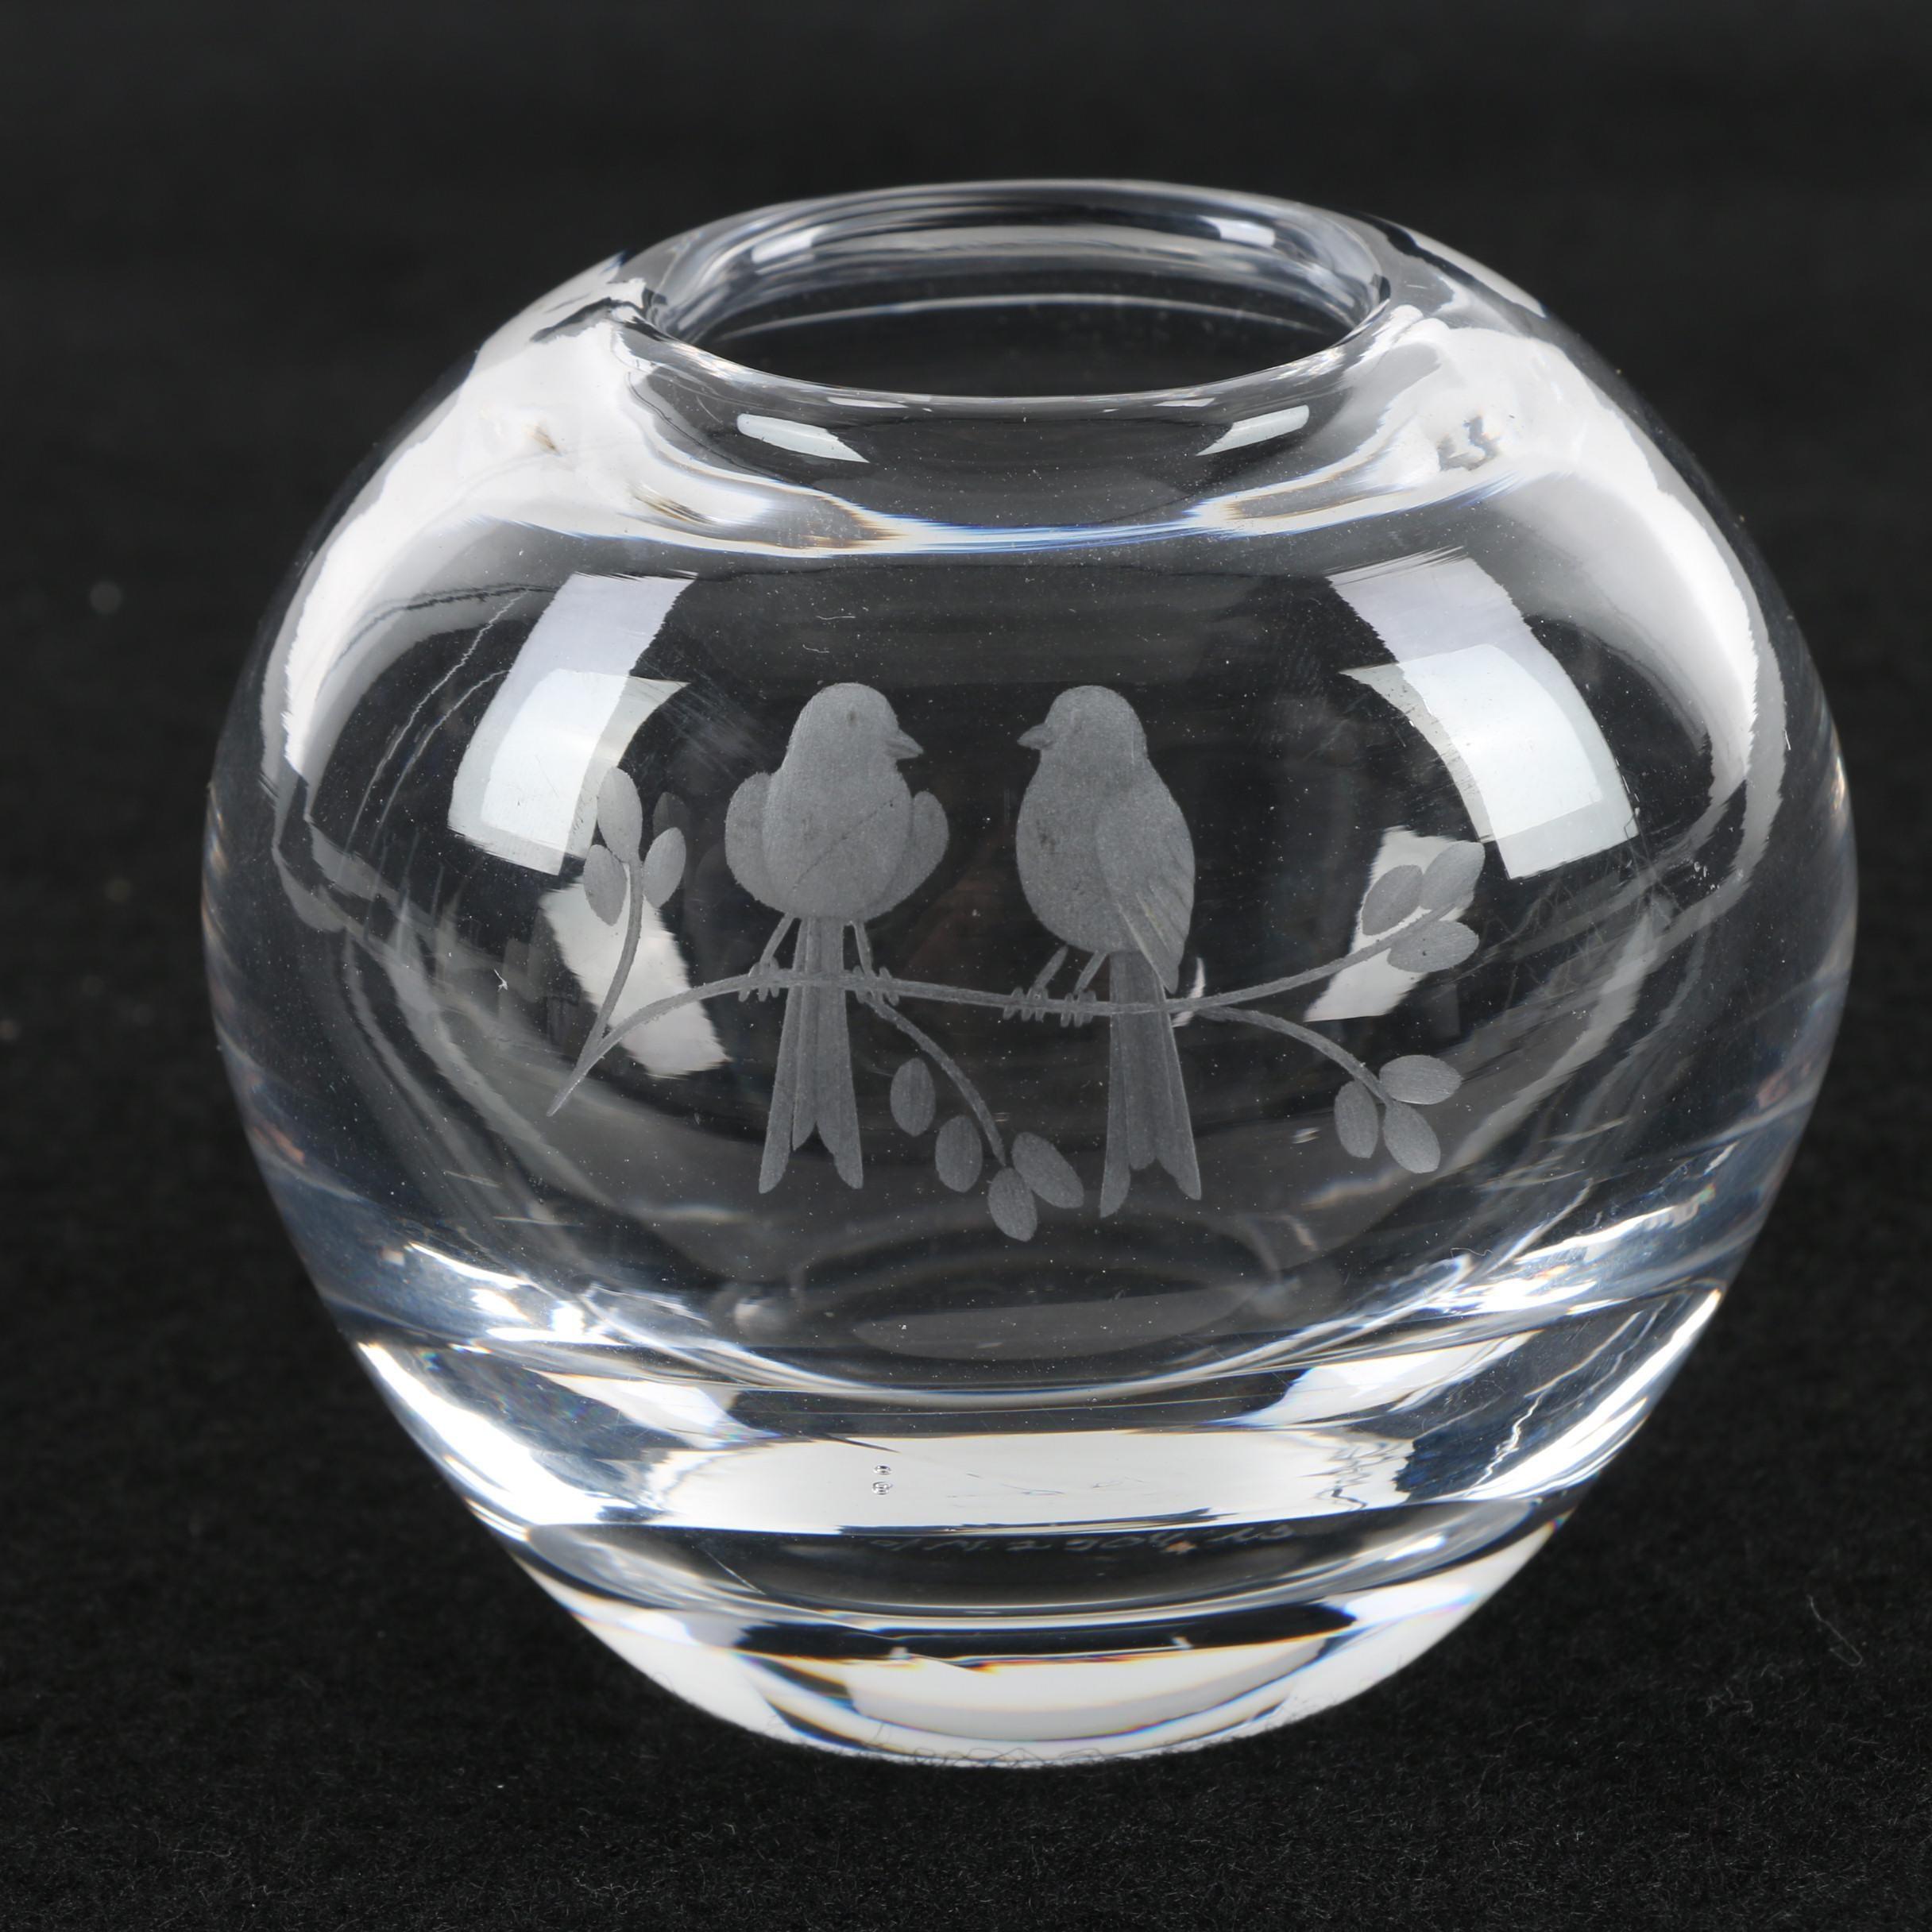 Signed Orrefors Swedish Crystal Vase